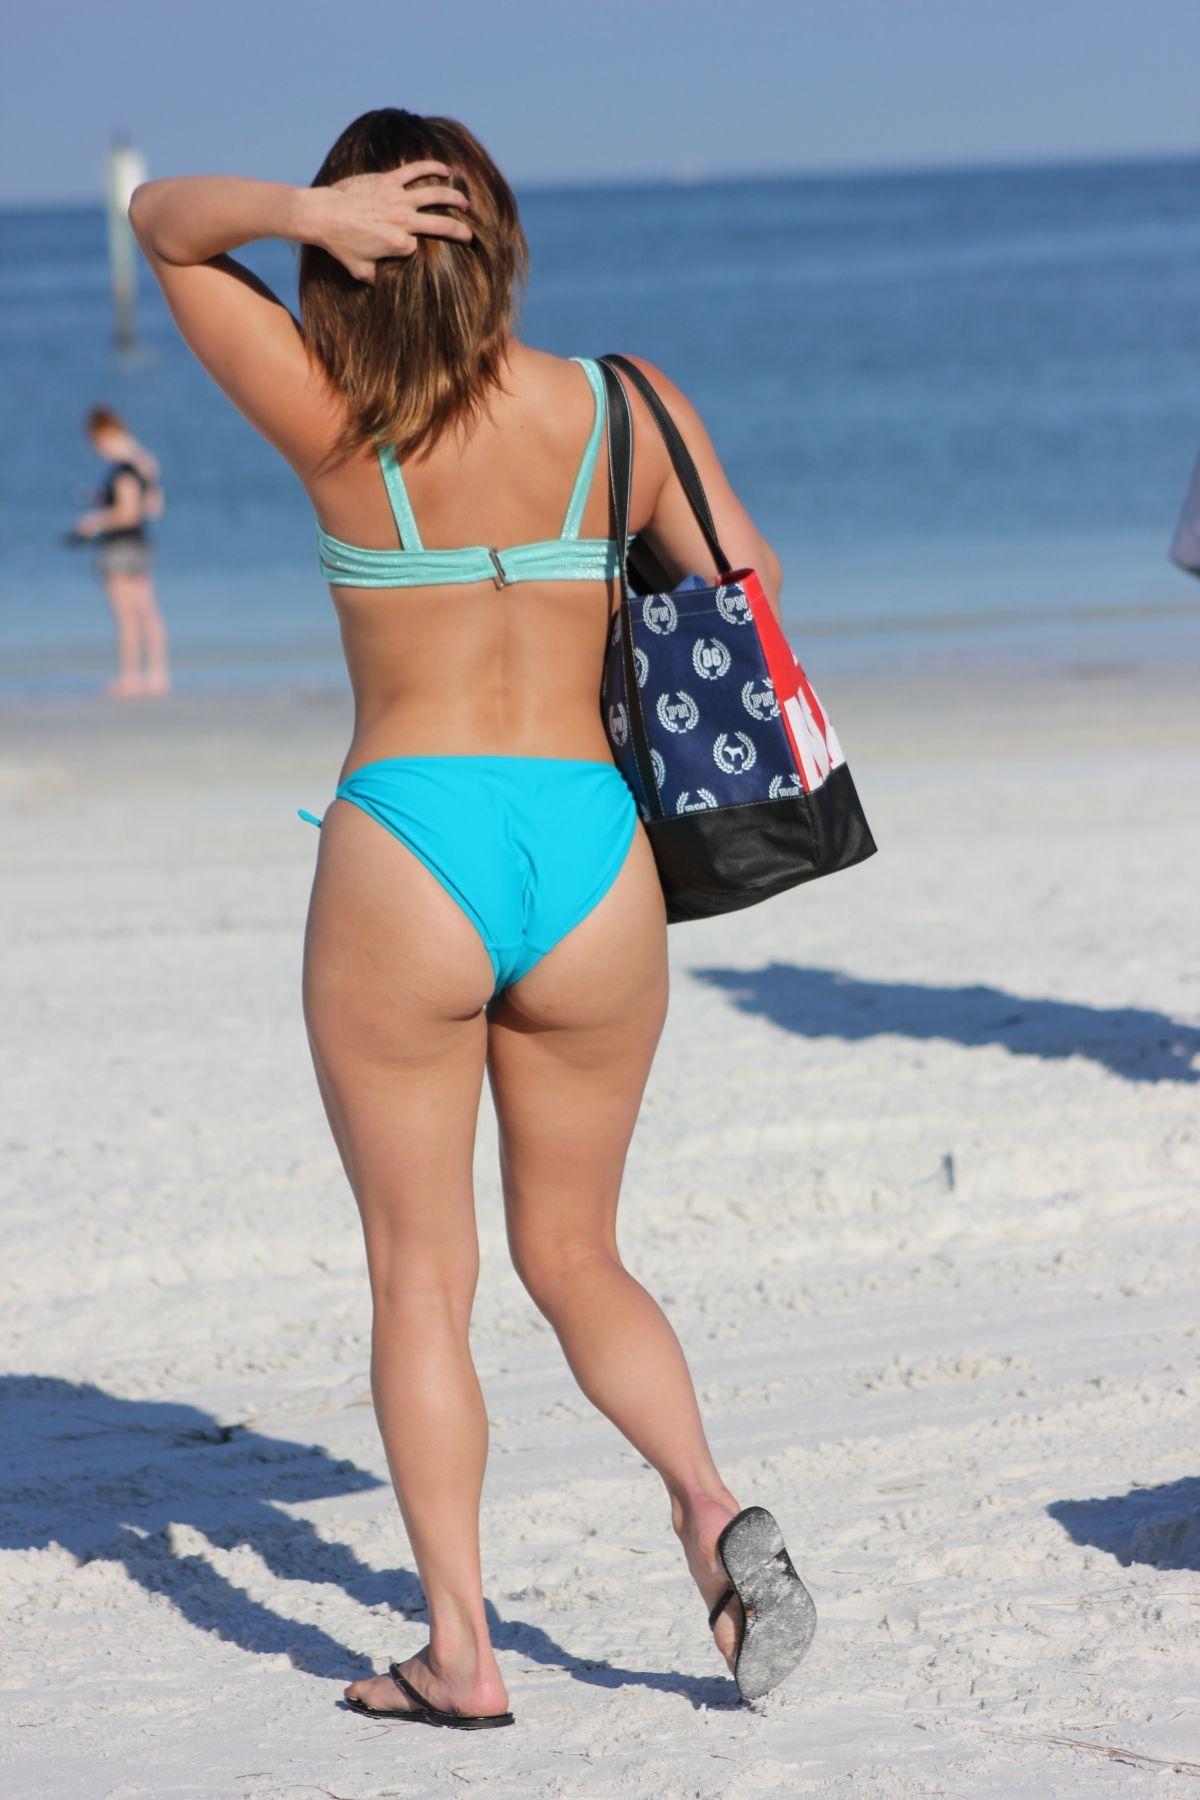 Bikini Maria Jade nudes (34 photo), Sexy, Cleavage, Twitter, cameltoe 2019